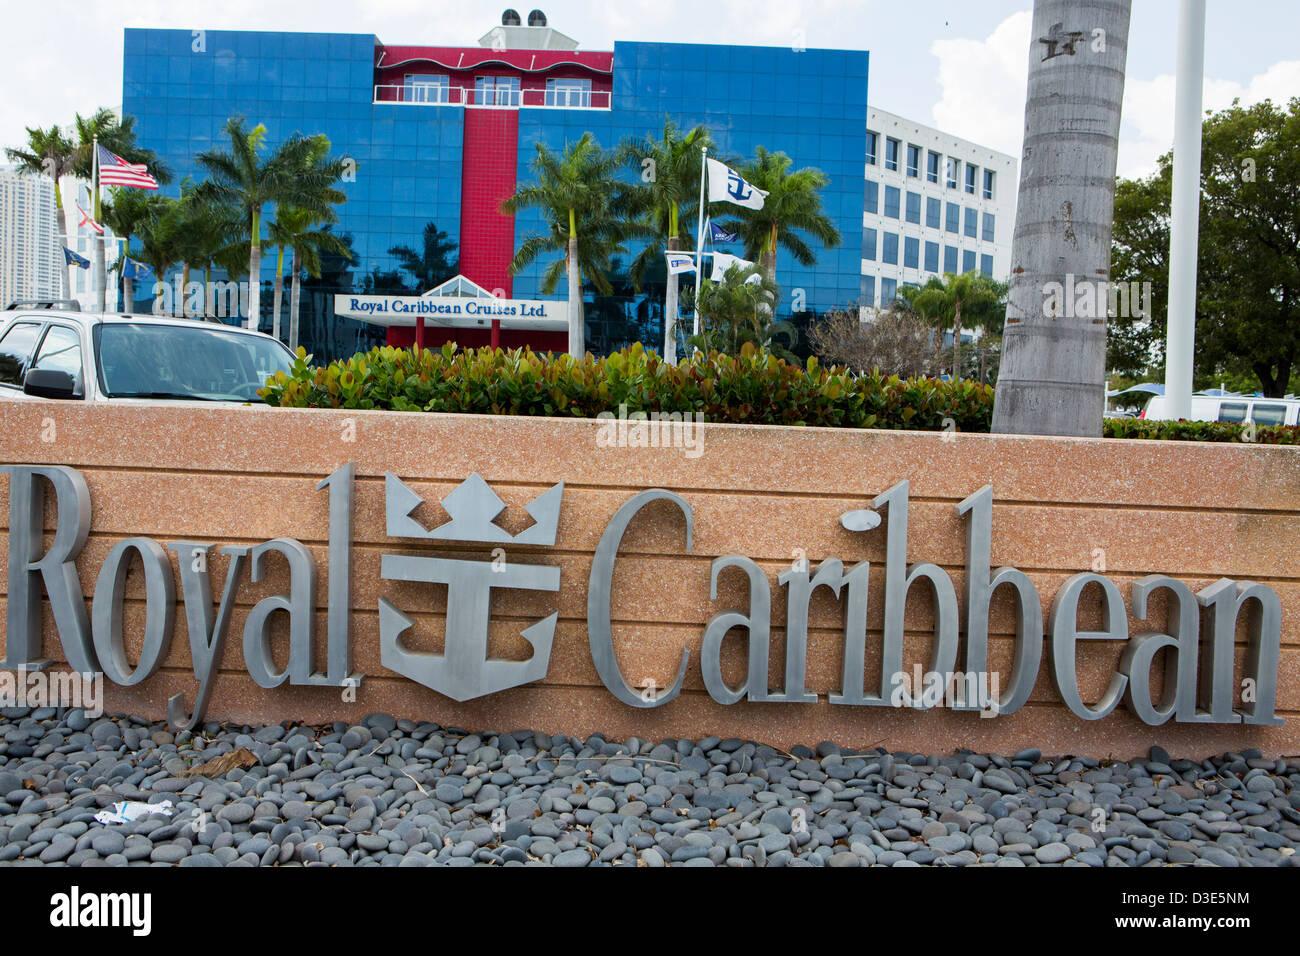 The headquarters of cruise operator Royal Caribbean Cruises Ltd. - Stock Image